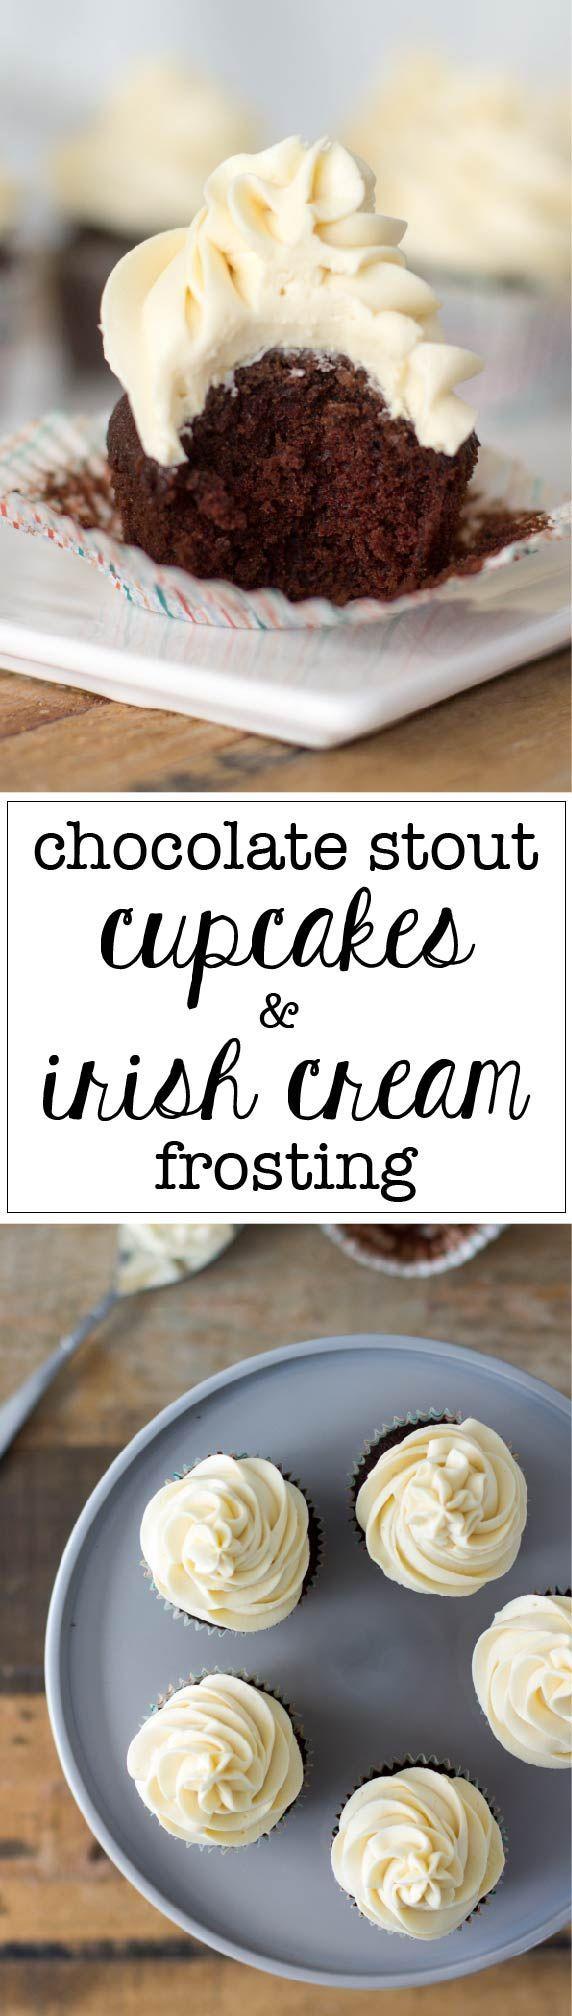 Moist, delicious chocolate stout cupcakes with the perfect Irish cream frosting. via @nourishandfete